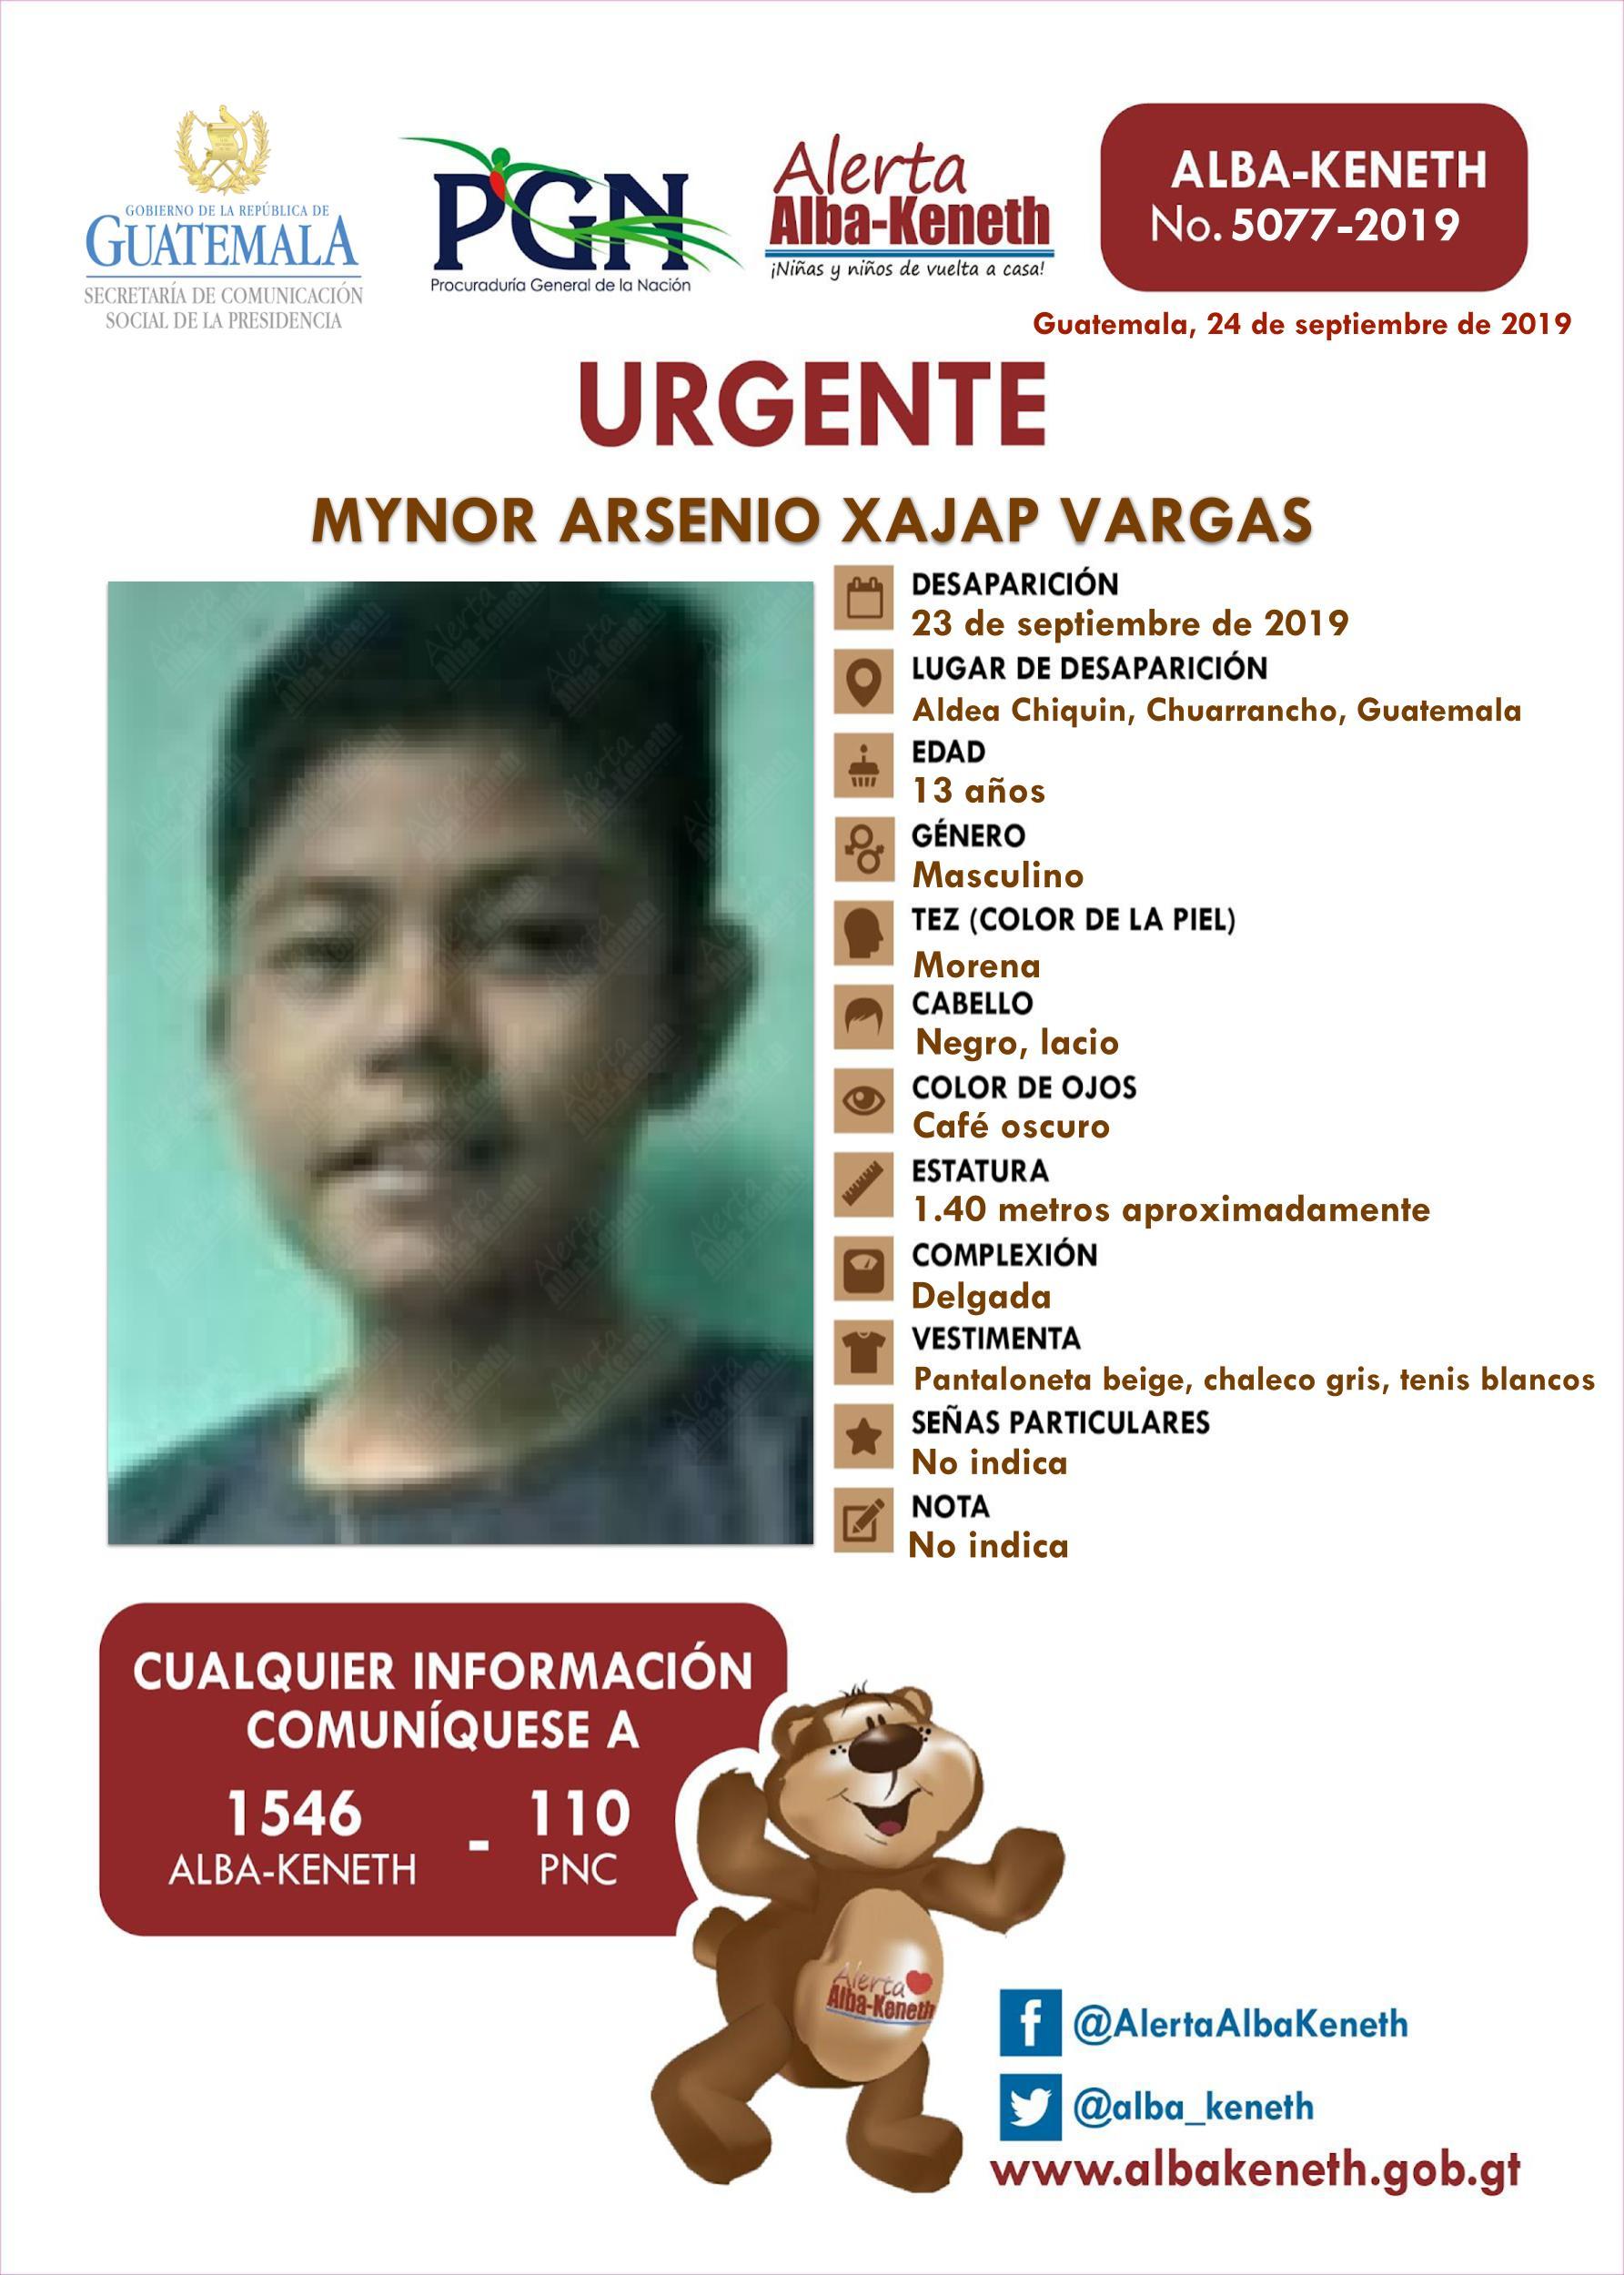 Mynor Arsenio Xajap Vargas